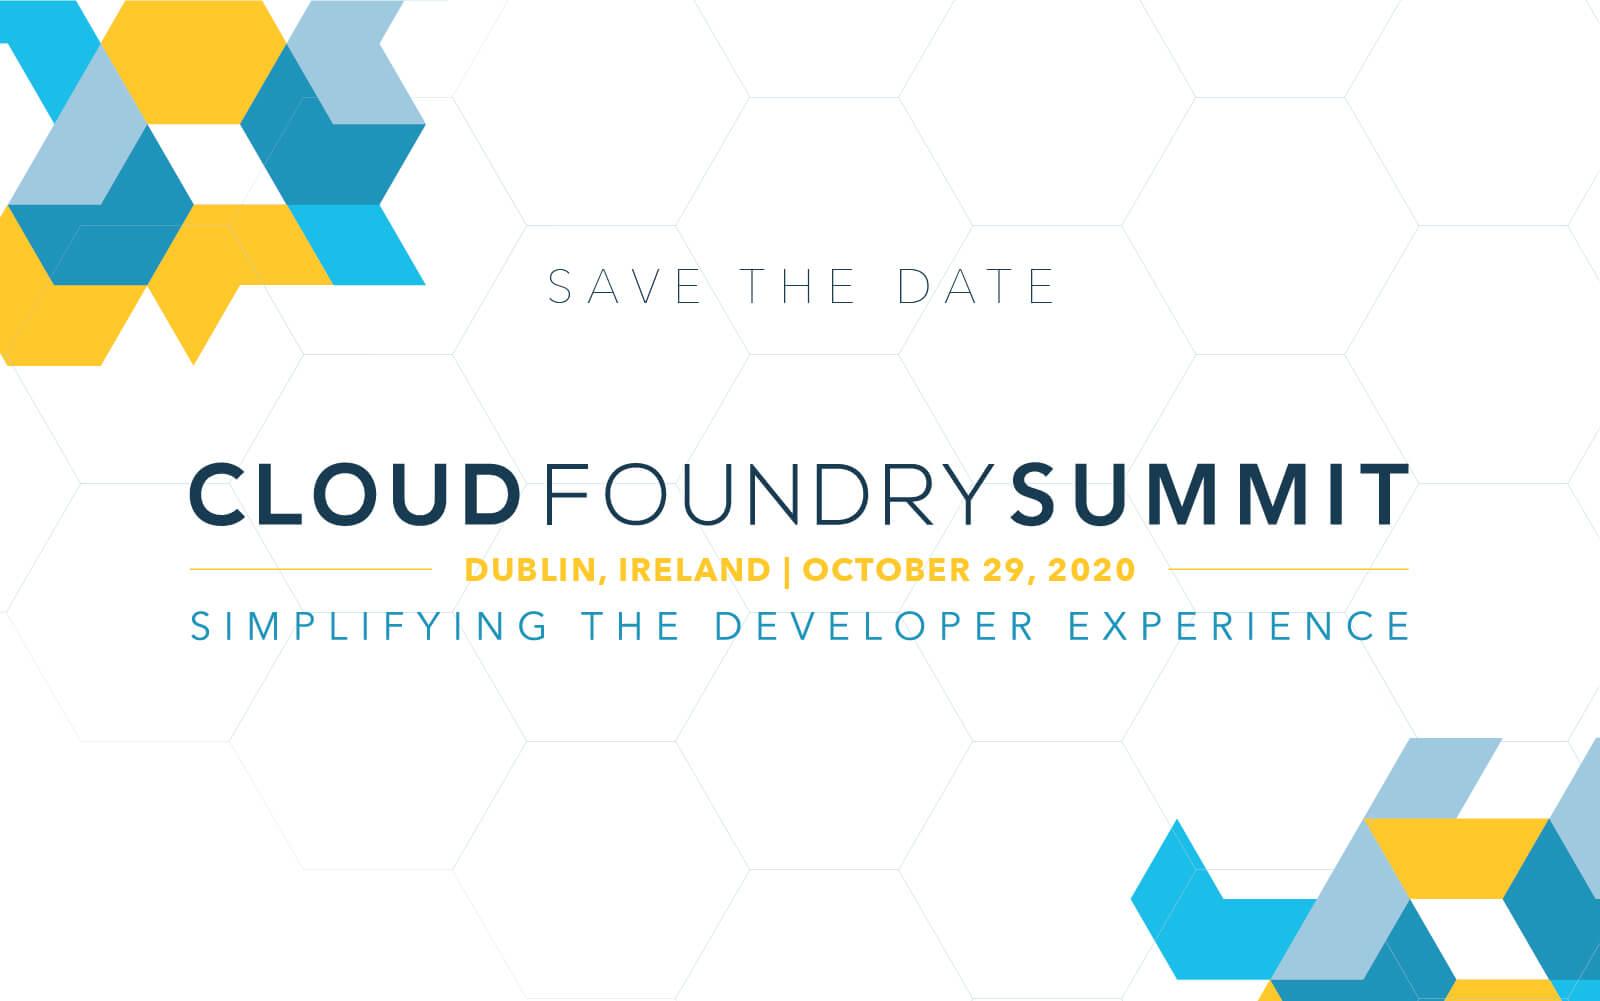 cloud foundry summit dublin ireland october 29 2020